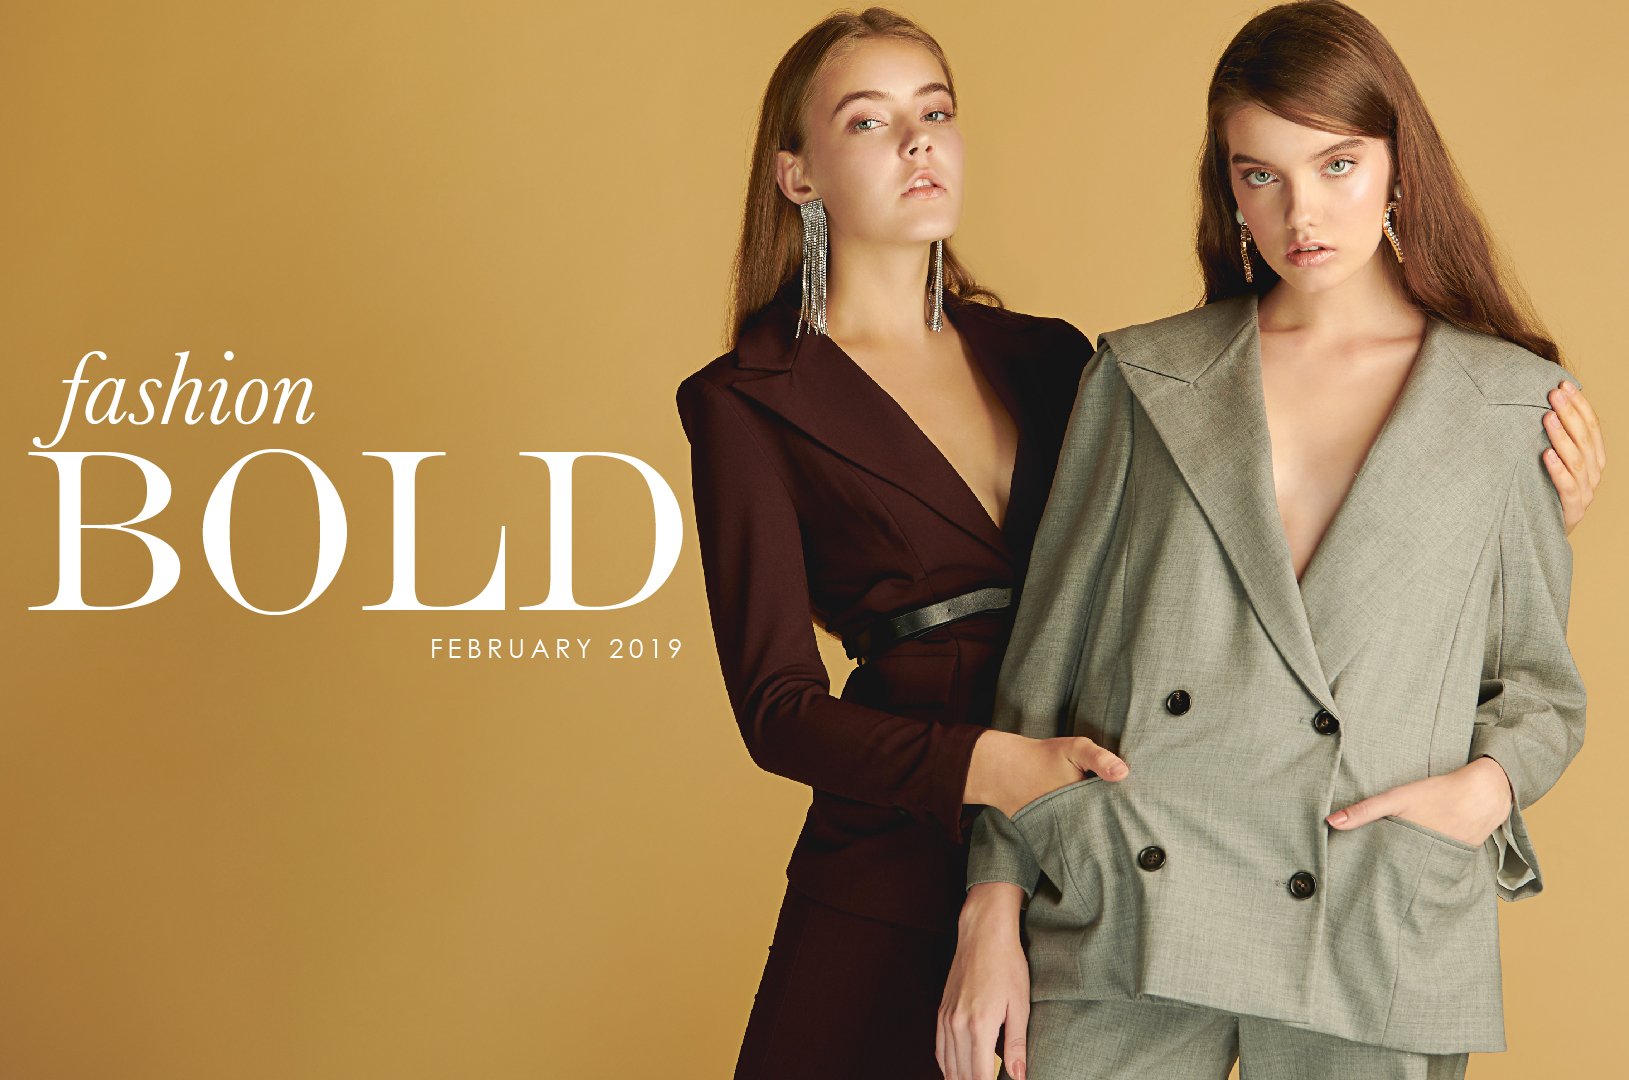 FashionBold